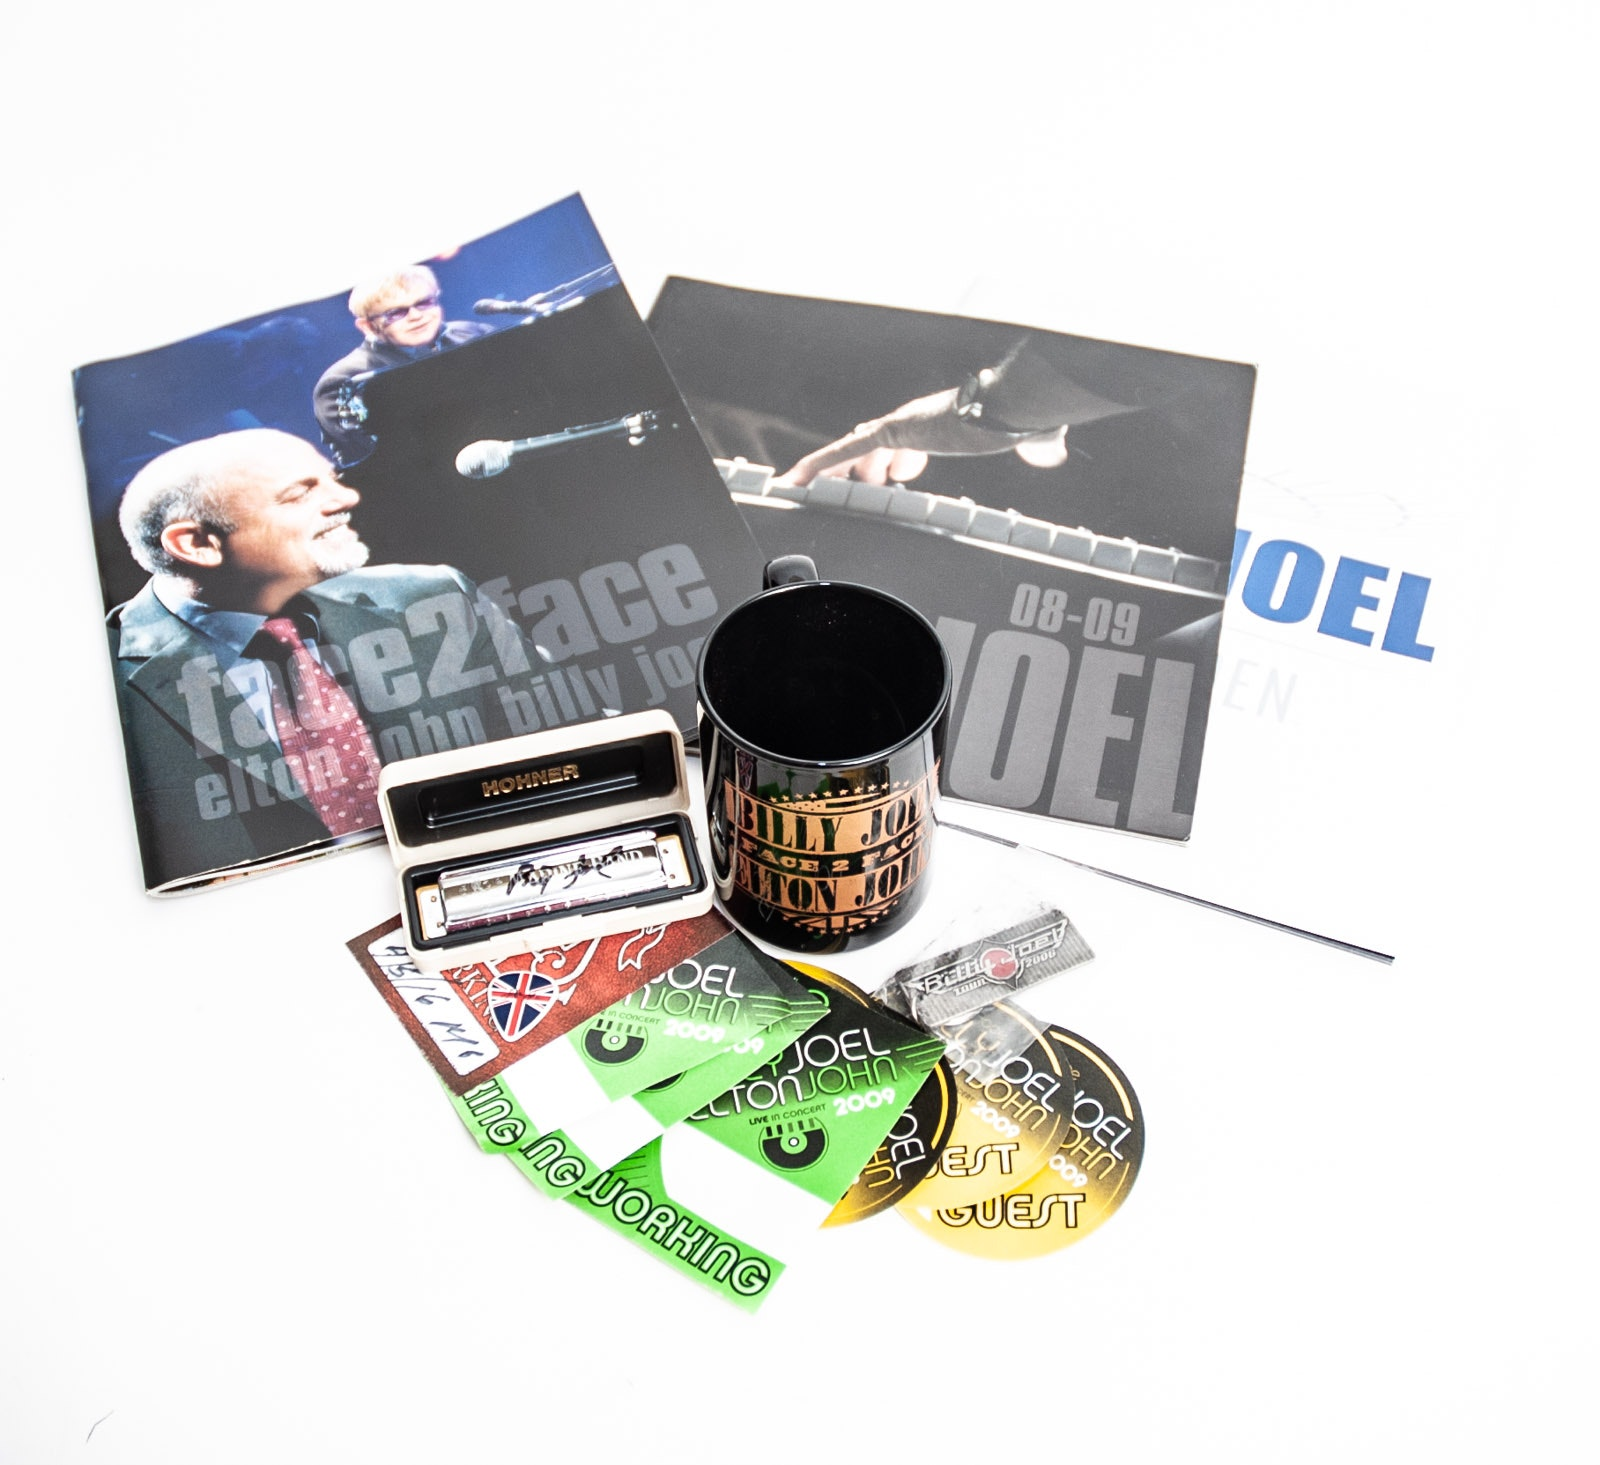 Autographed Billy Joel Hermonica and Tour Memorabilia